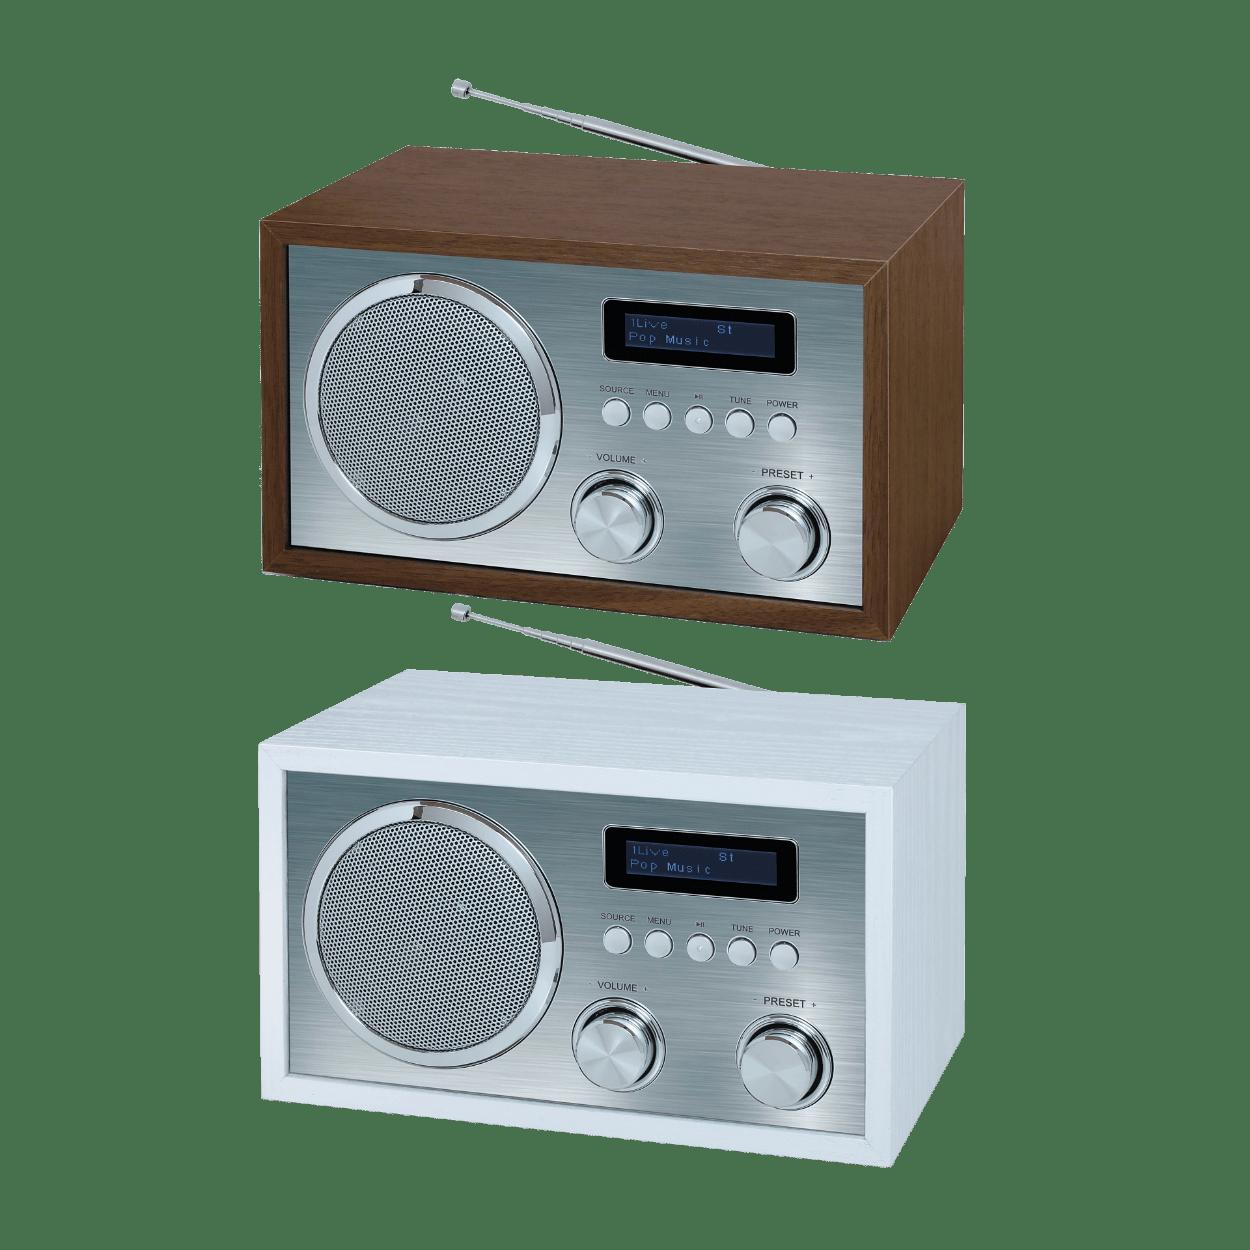 dab radio met bluetooth voordelig bij aldi. Black Bedroom Furniture Sets. Home Design Ideas